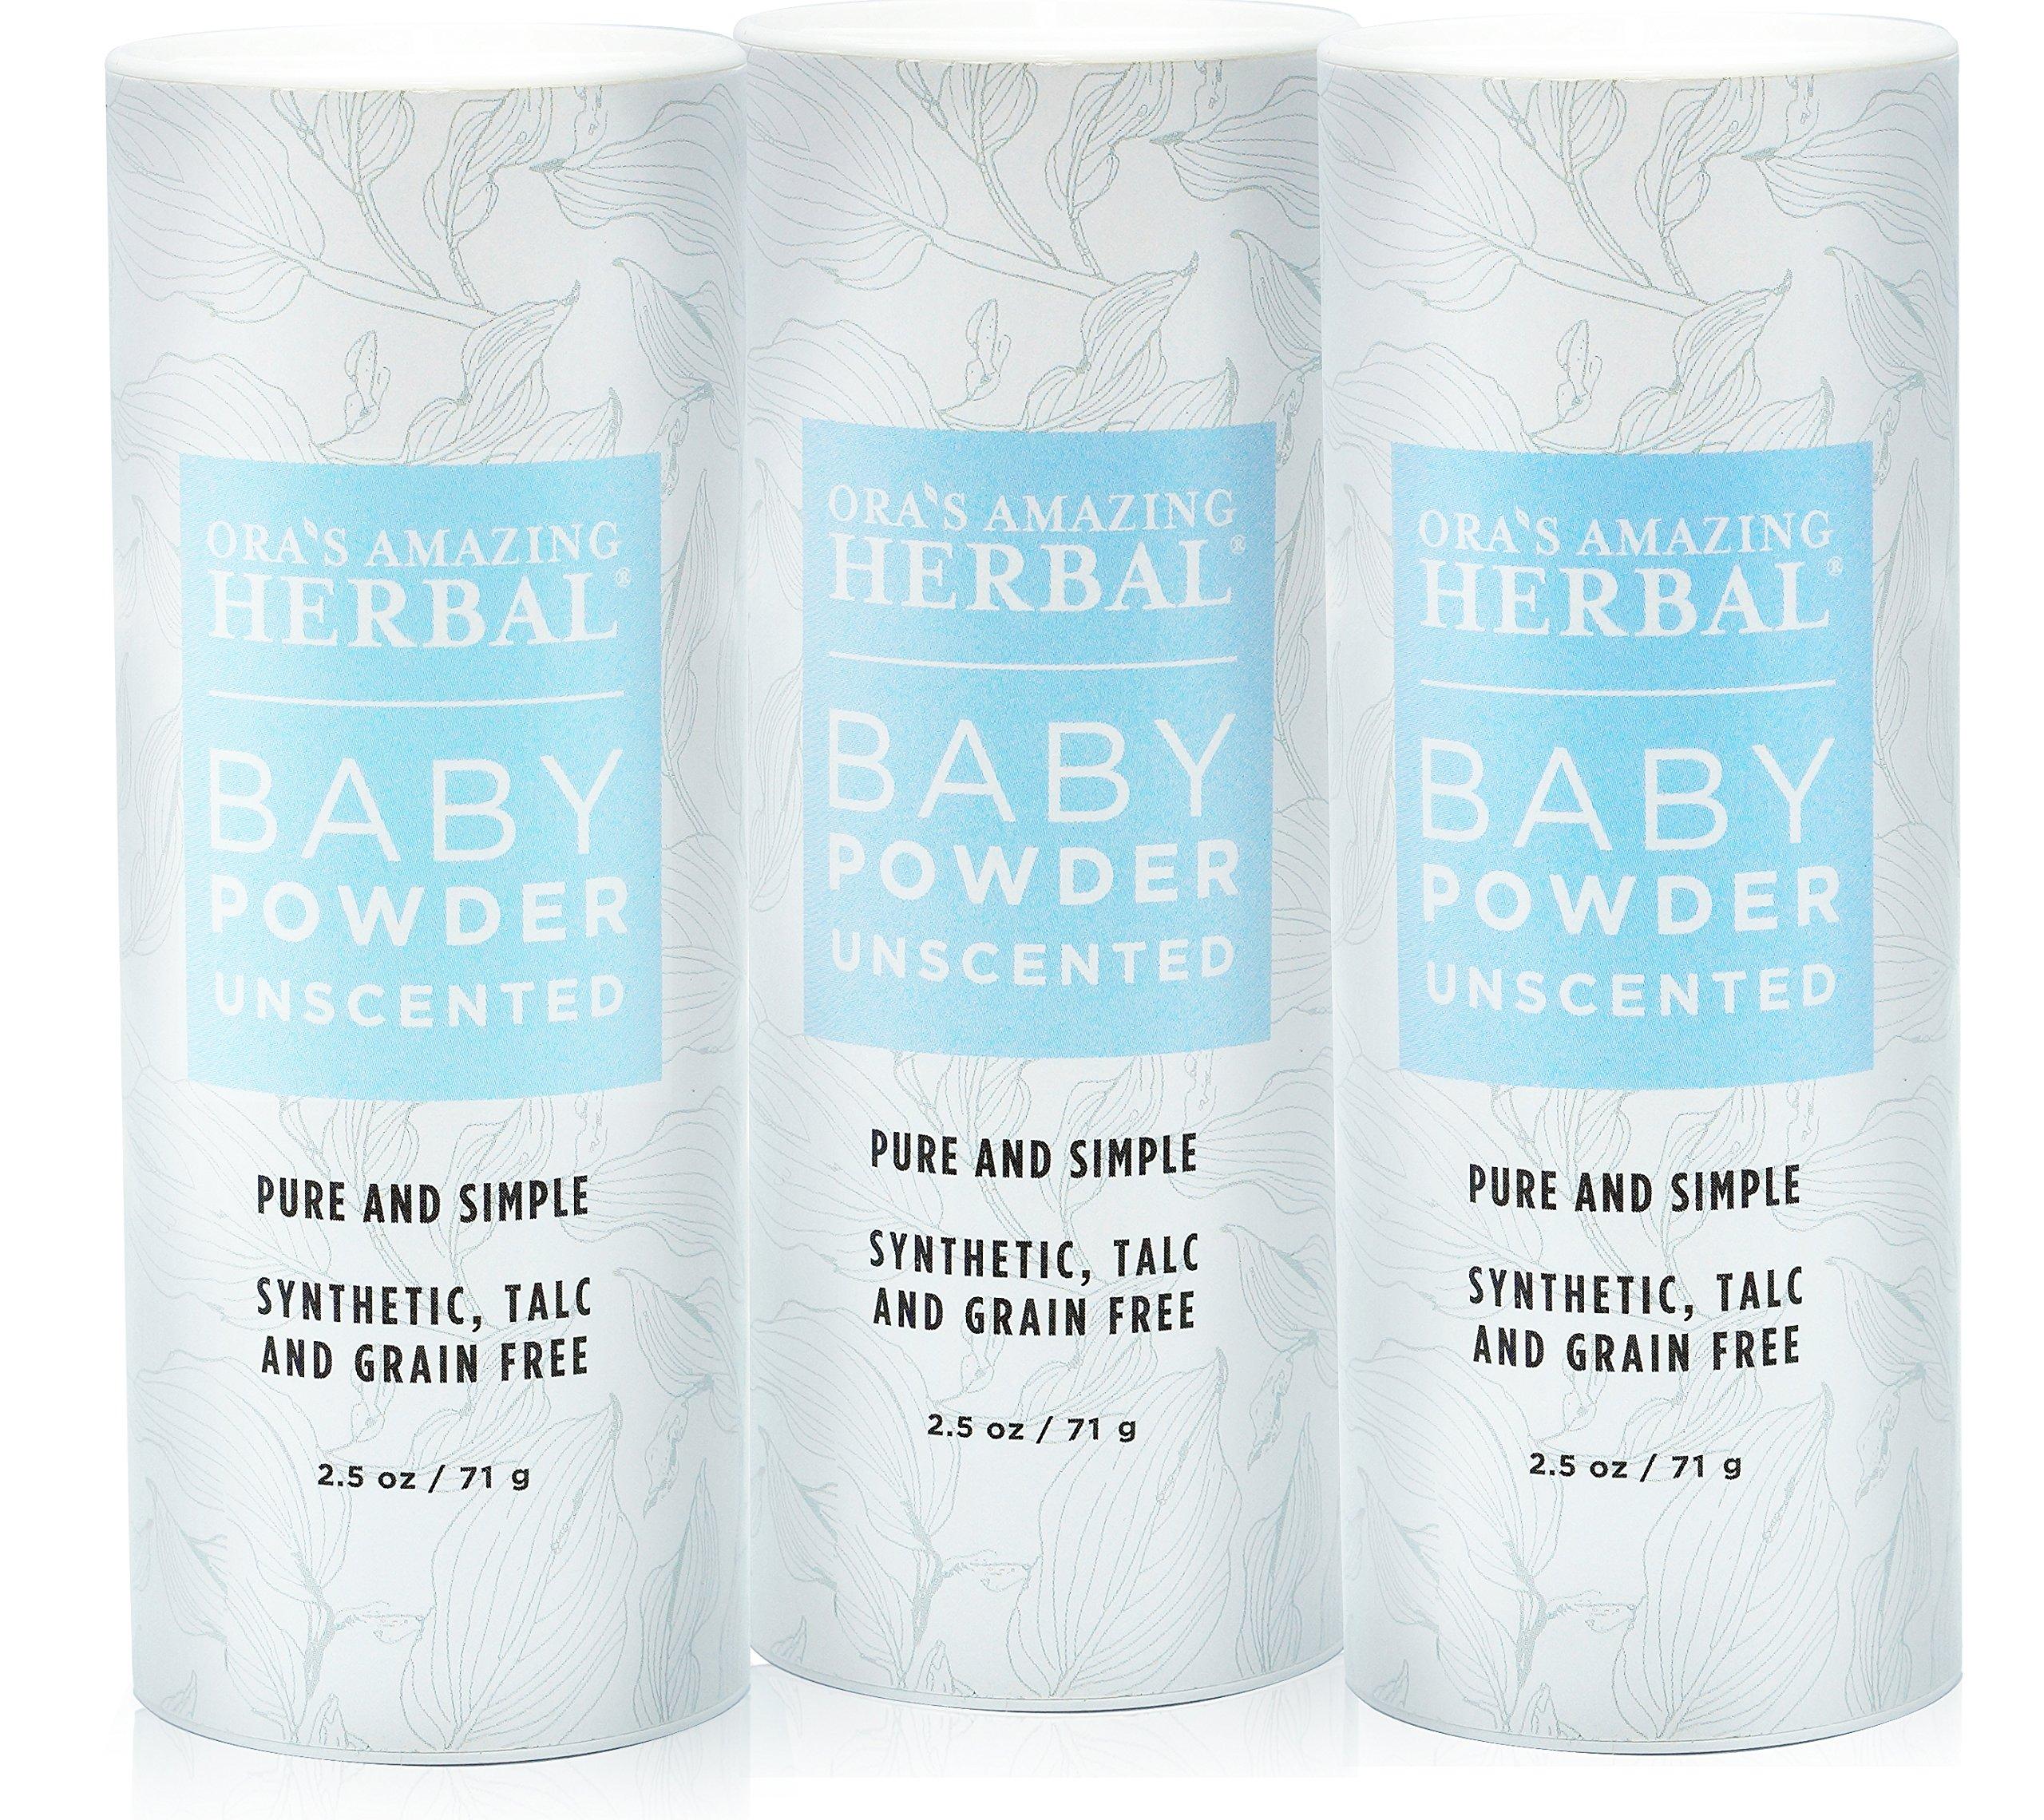 Ora's Amazing Herbal Talc-Free Grain-Free Gluten-Free Corn-Free Baby Powder 2.5oz ... (Unscented 3 Pack) by Ora's Amazing Herbal